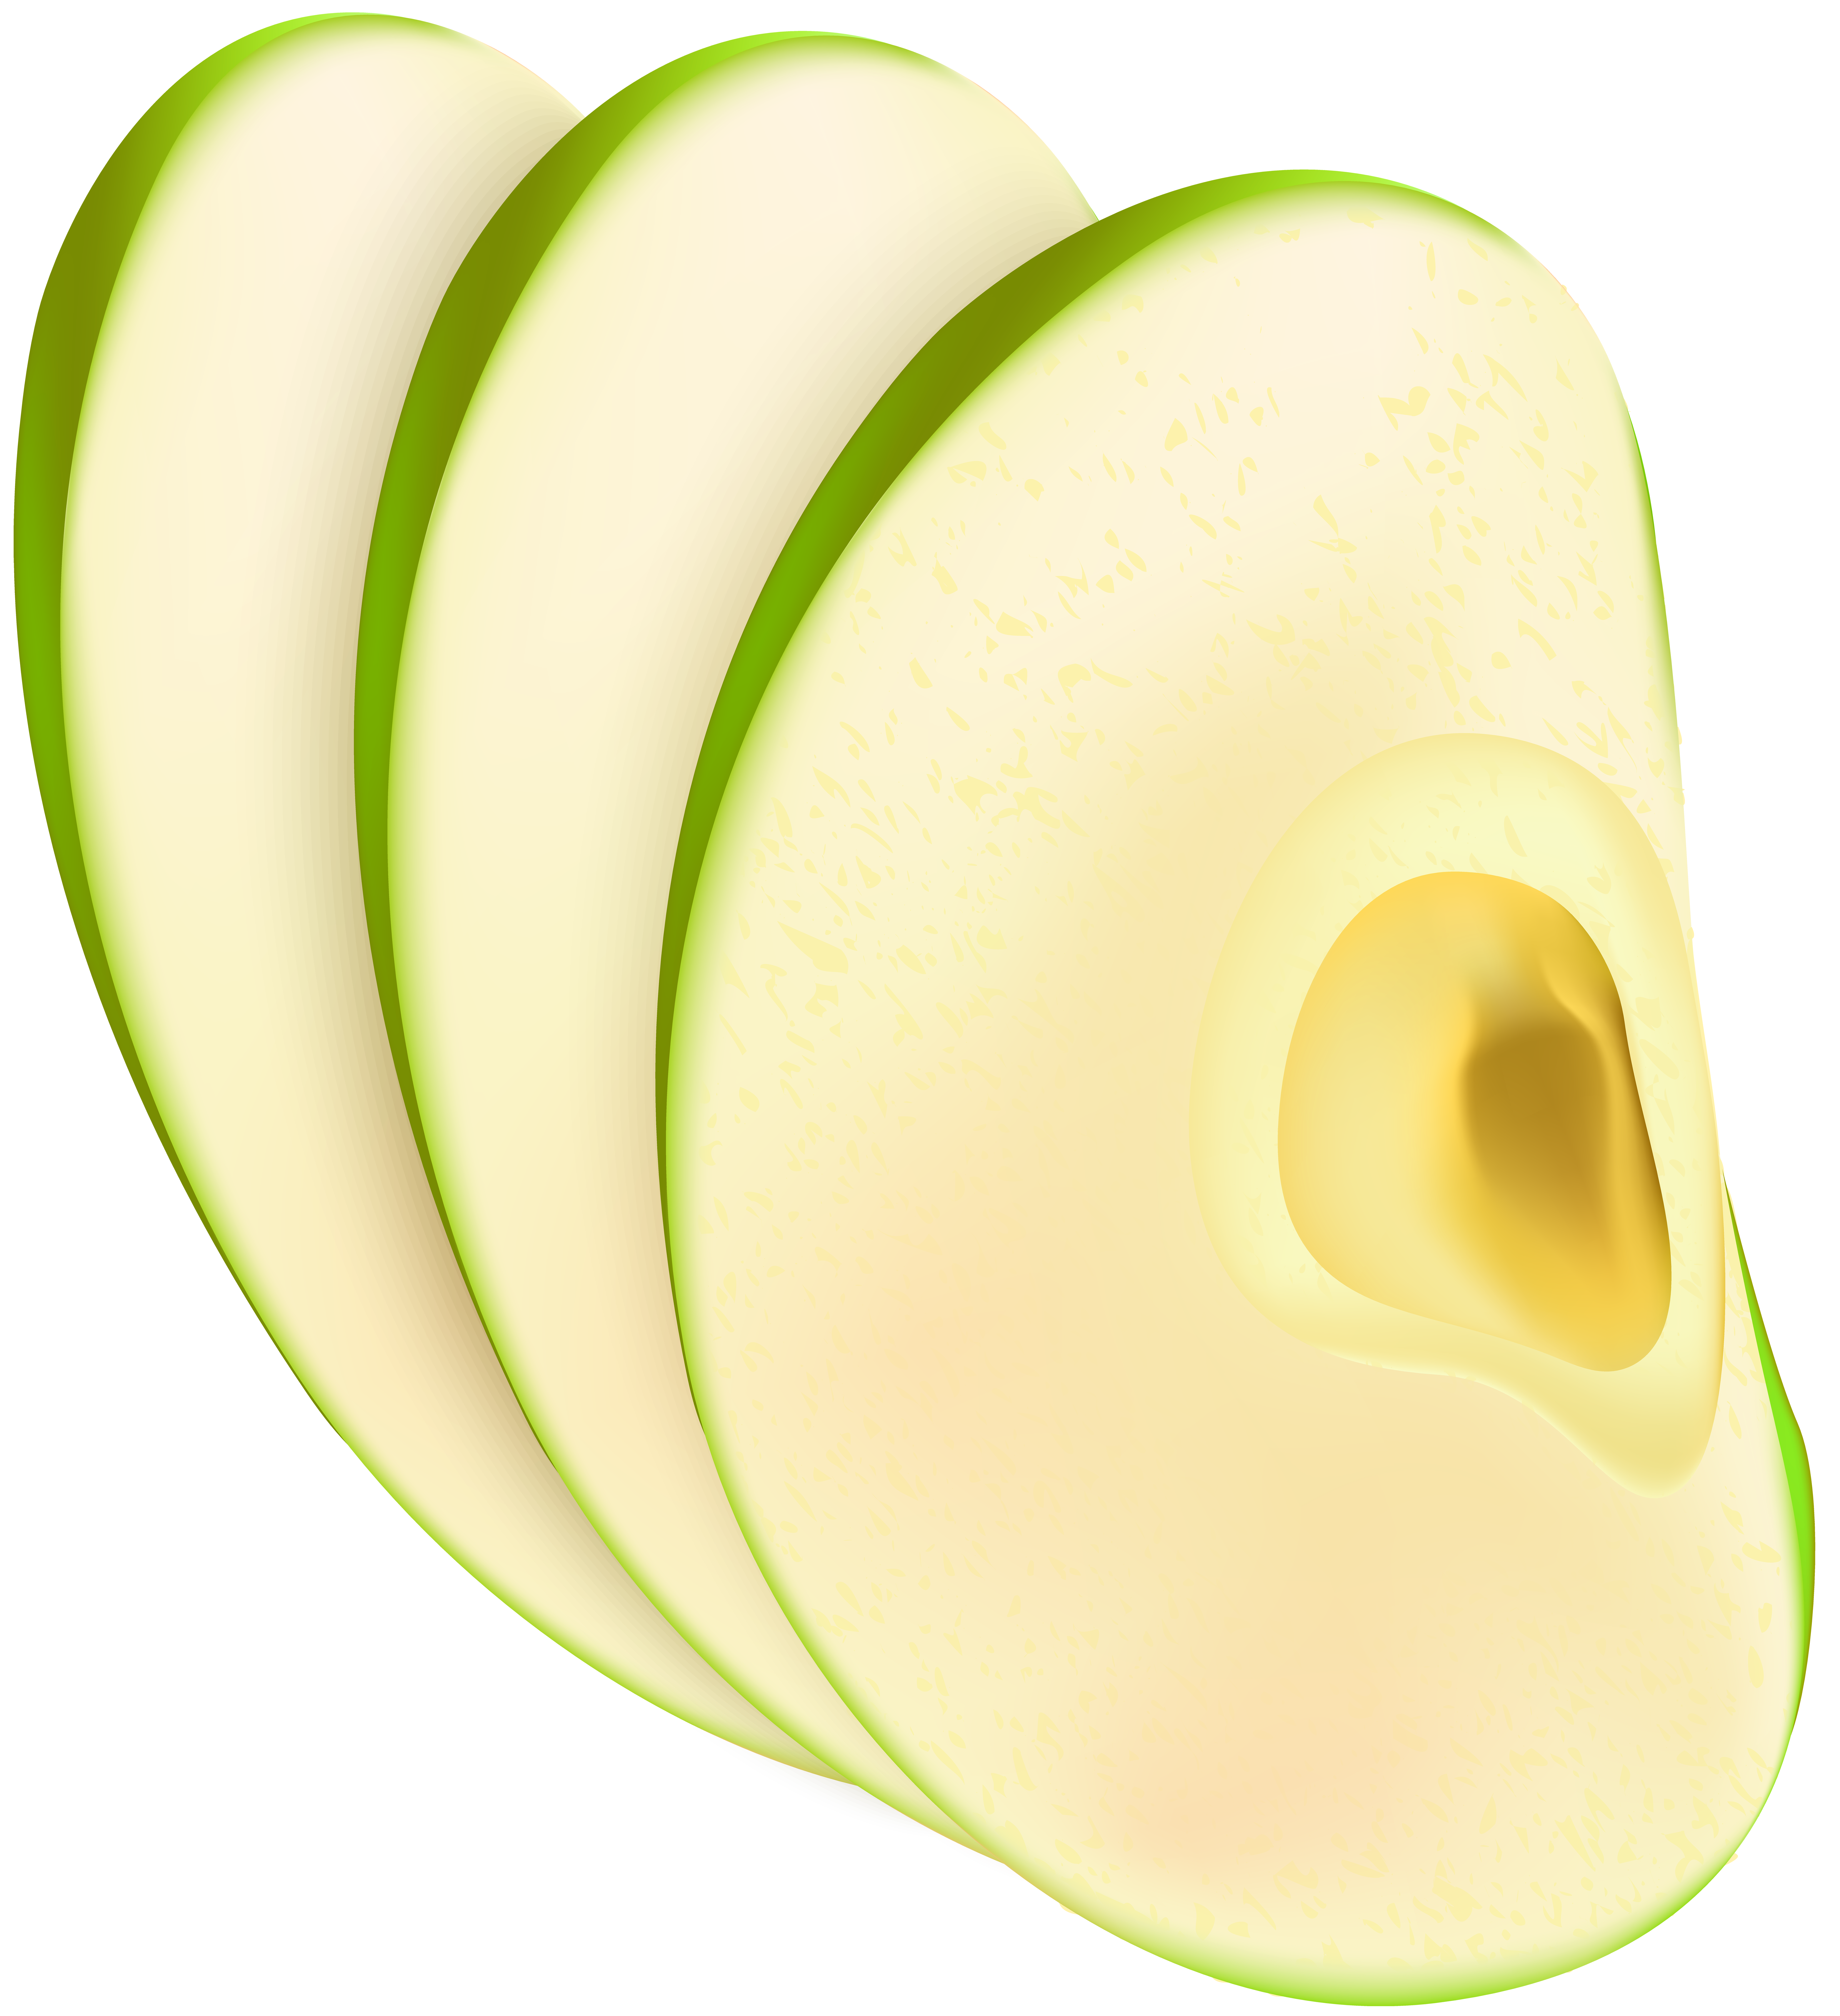 Apple Slices PNG Clip Art Image.